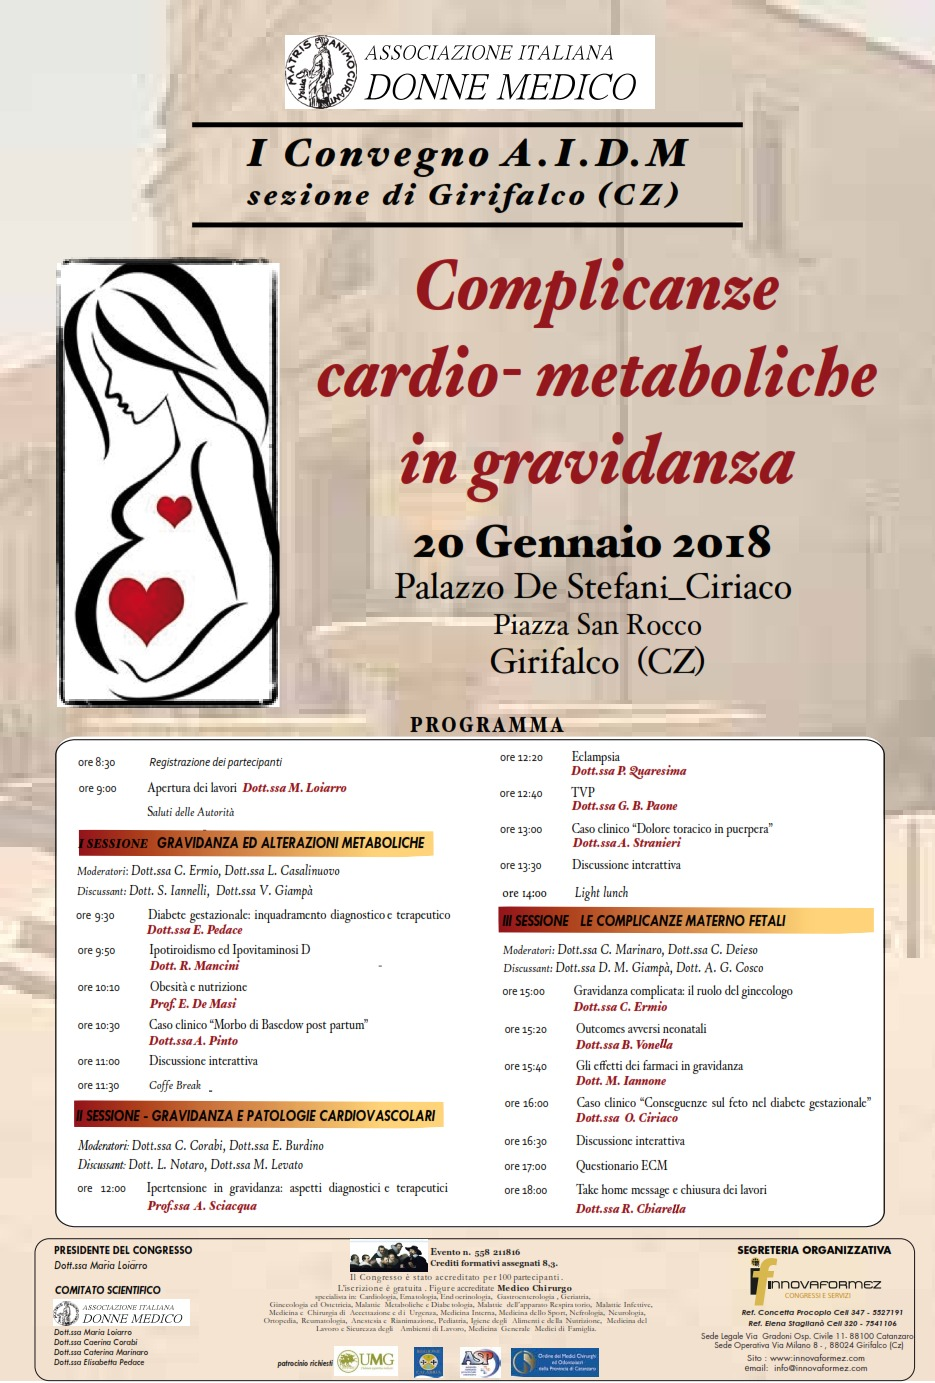 AIDM 20Gennaio2017 Girifalco  - #AIDM_20Gennaio2017_Girifalco_